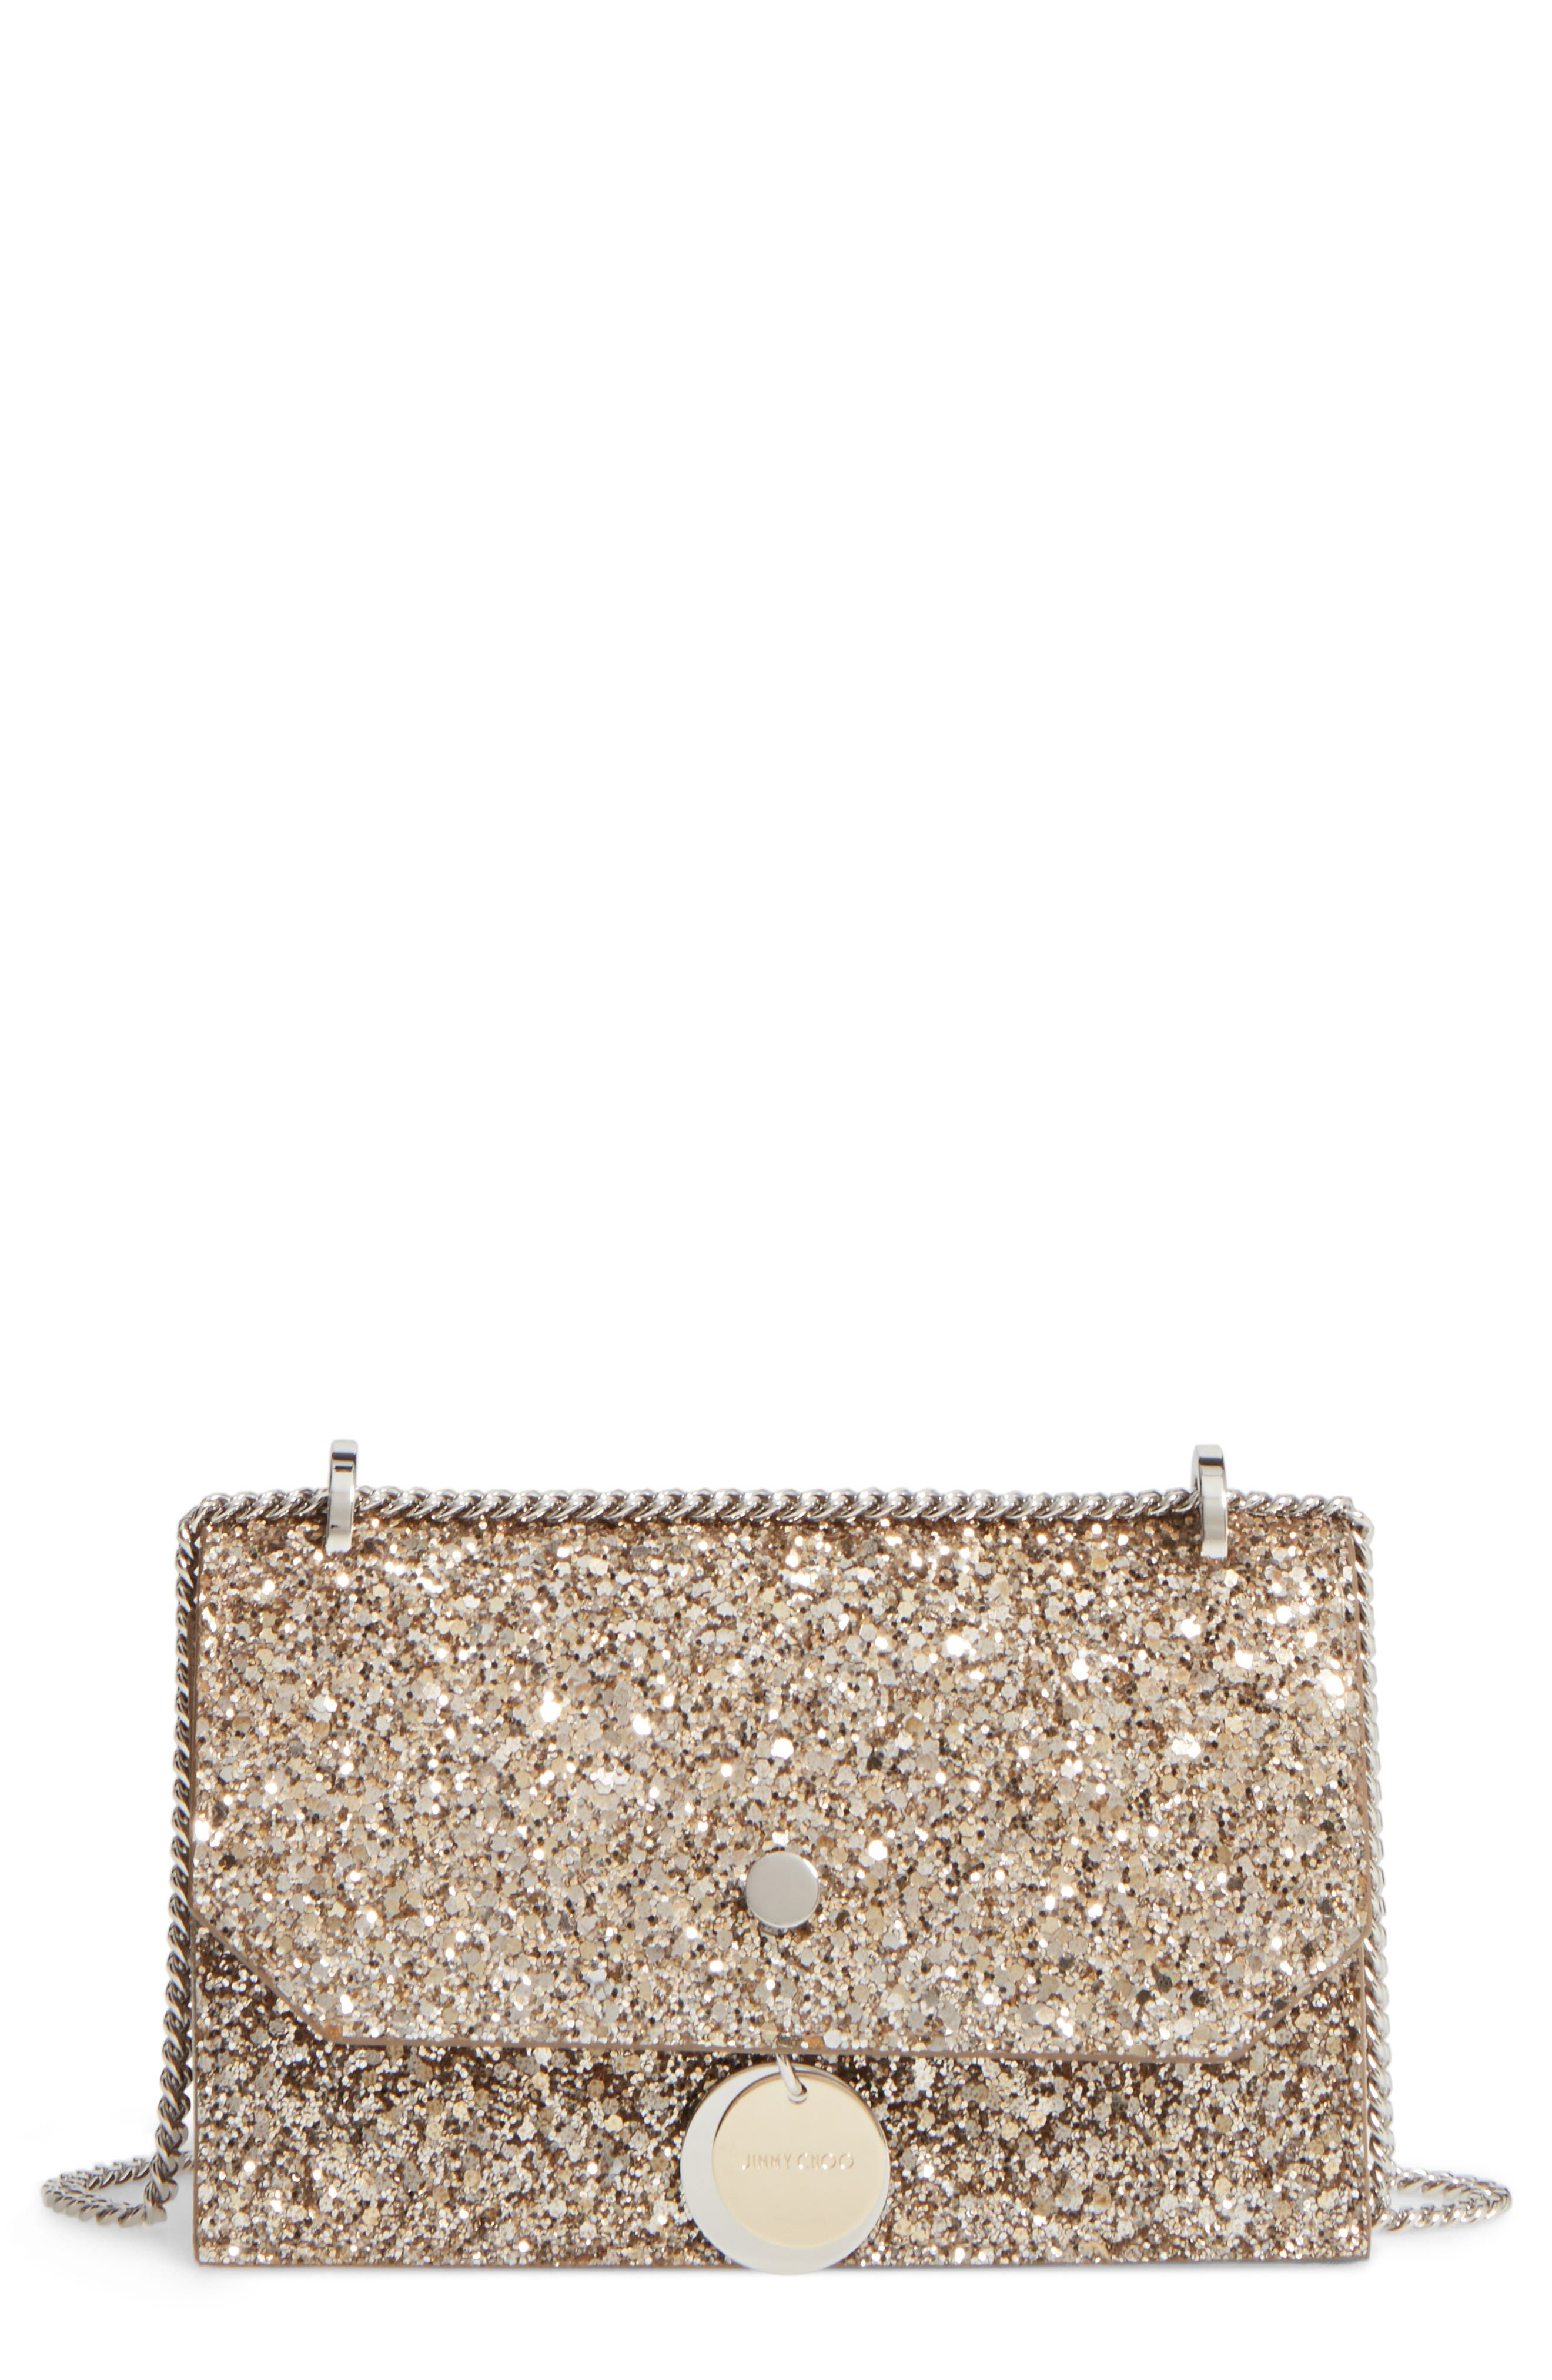 Alternate Image 1 Selected - Jimmy Choo Finley Shadow Glitter Shoulder Bag